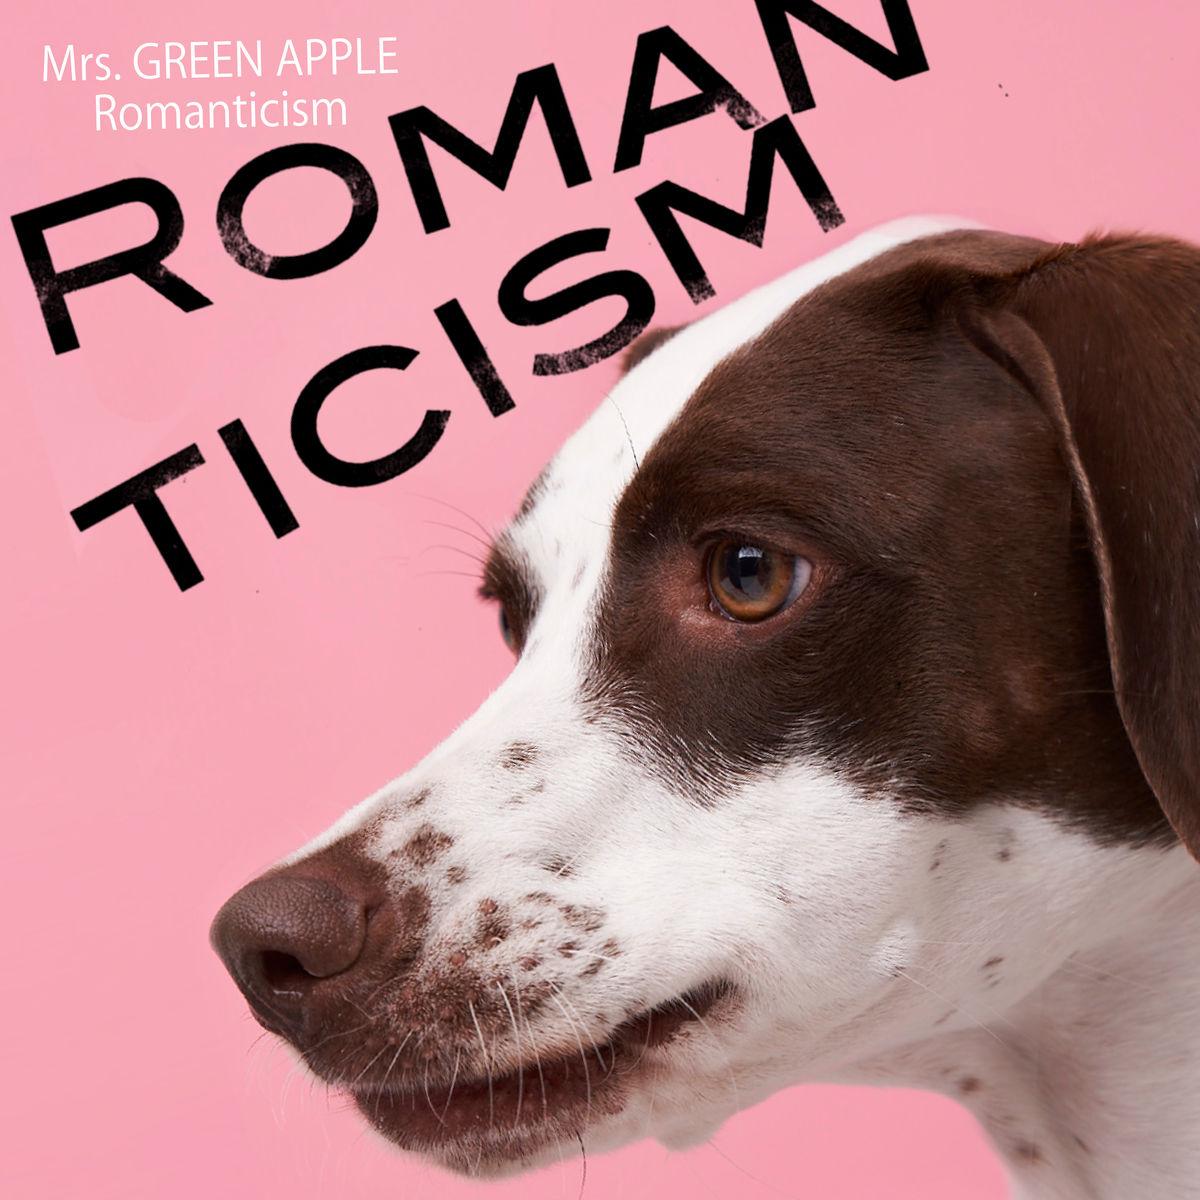 『Mrs. GREEN APPLE - How-to』収録の『ロマンチシズム』ジャケット